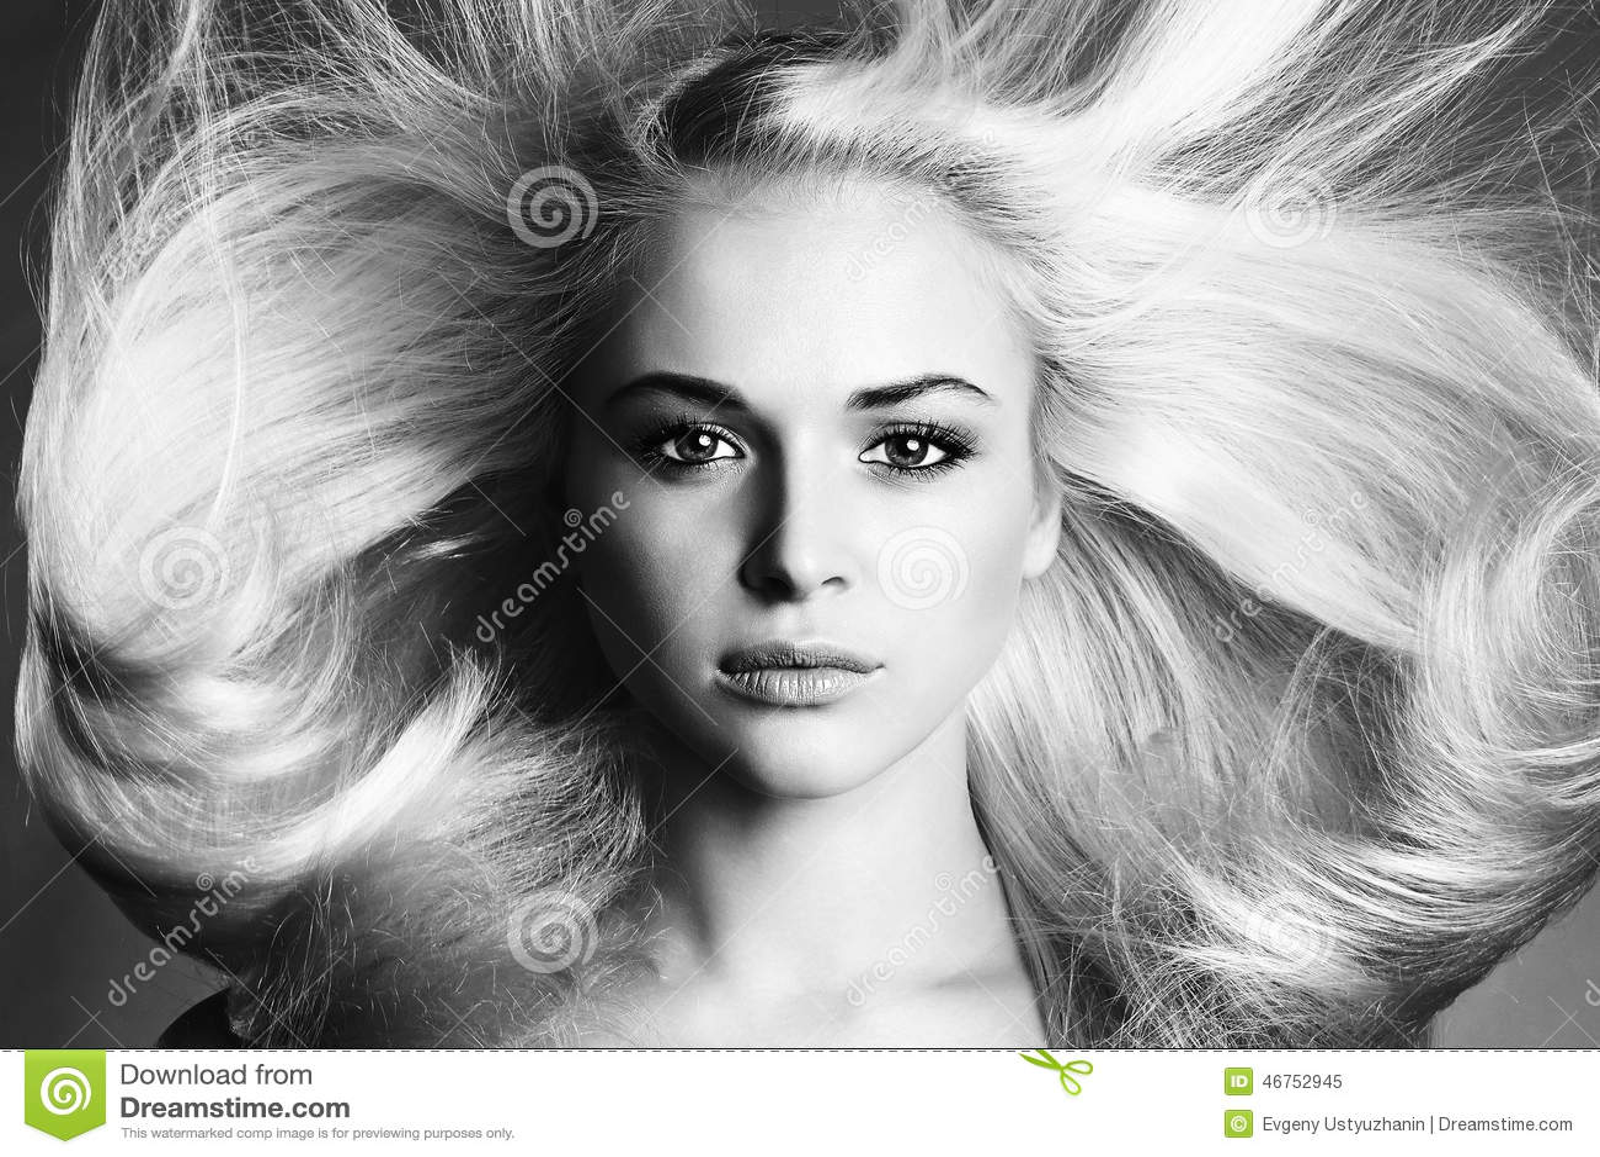 Stock Photo Beautiful Face Young Woman Blond Girl Monochrome Portrait ...